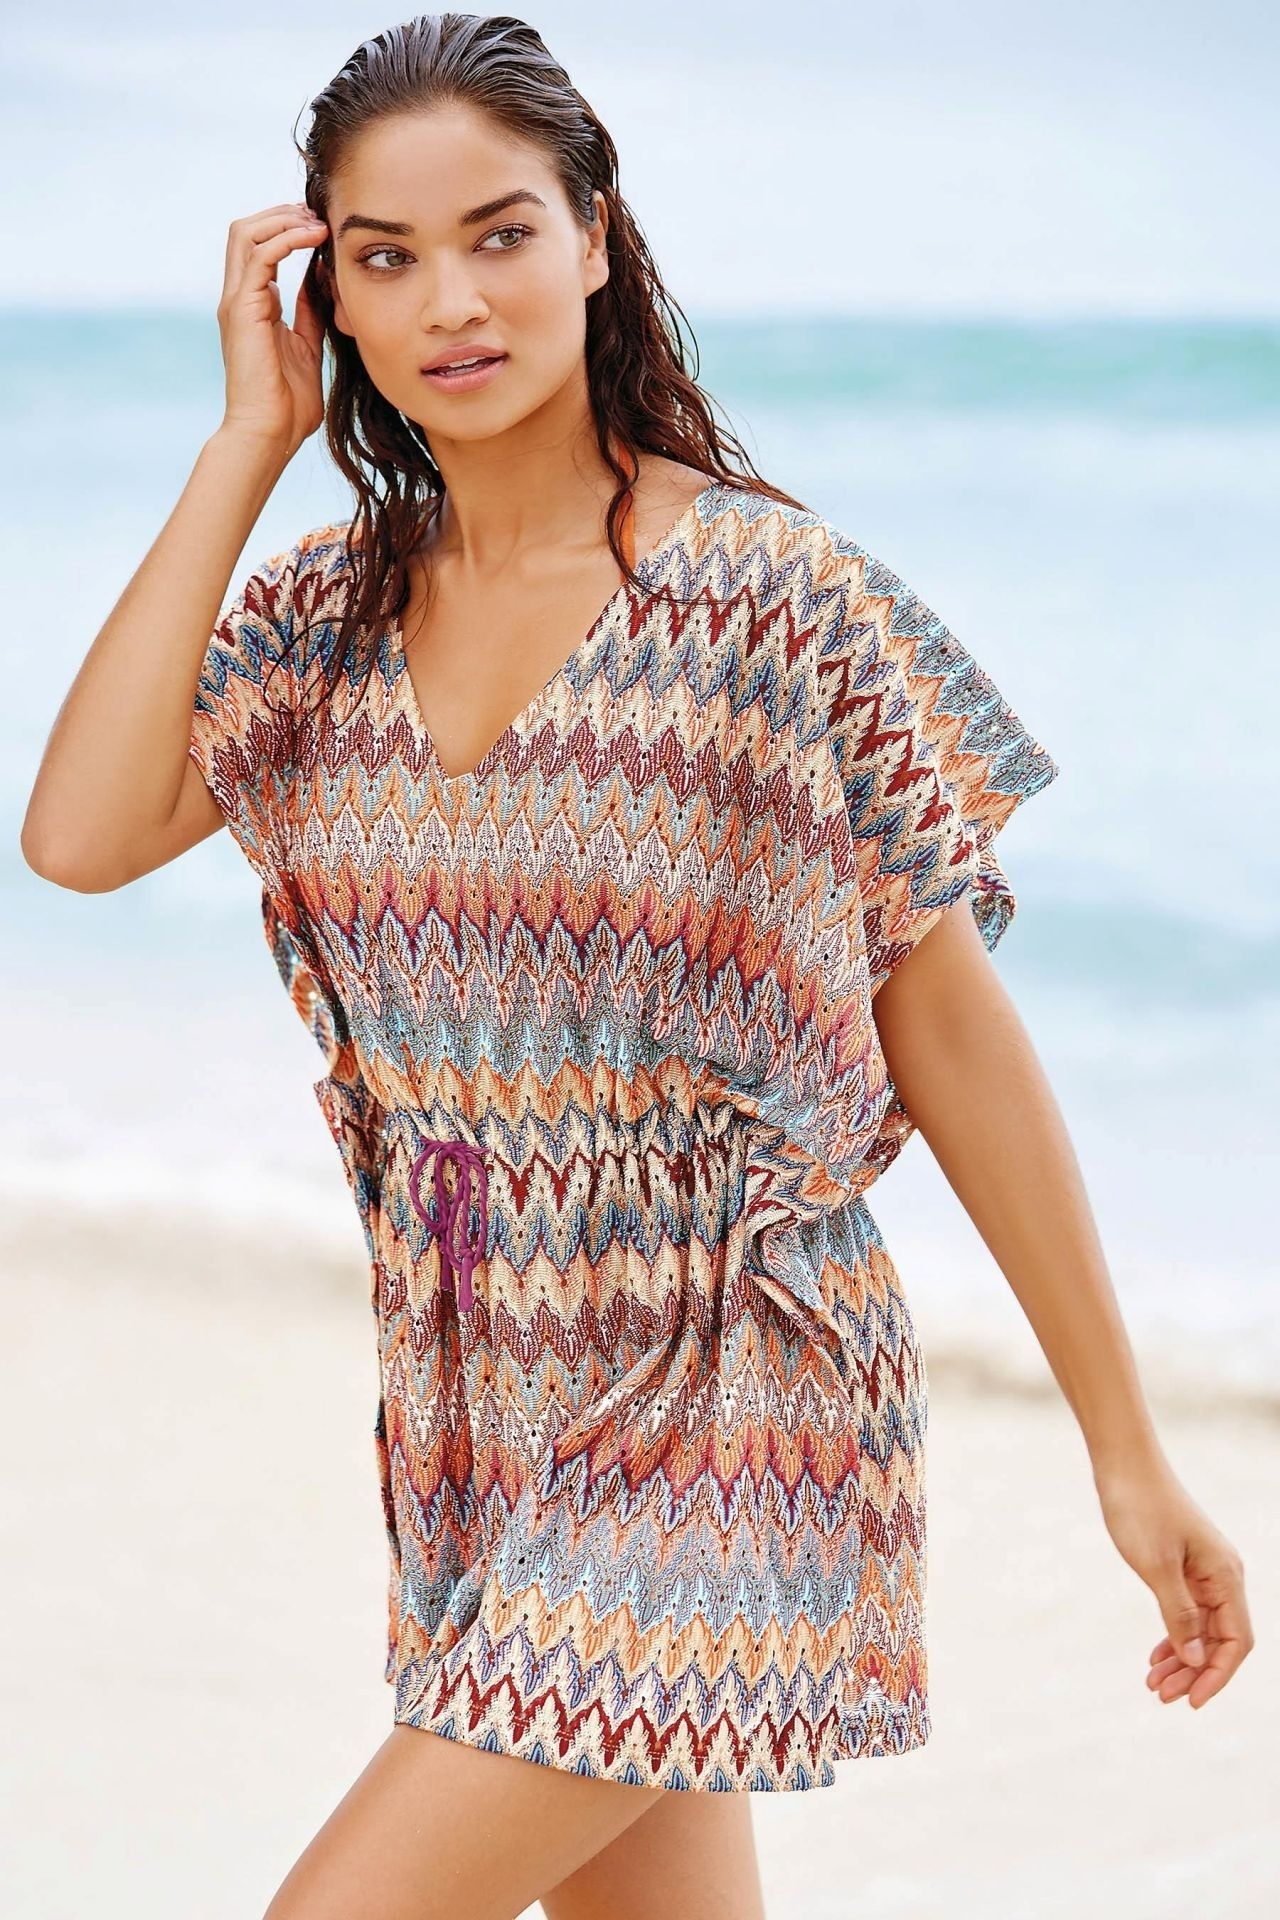 Shanina Shaik - Next Swimwear and Beachwear Collection